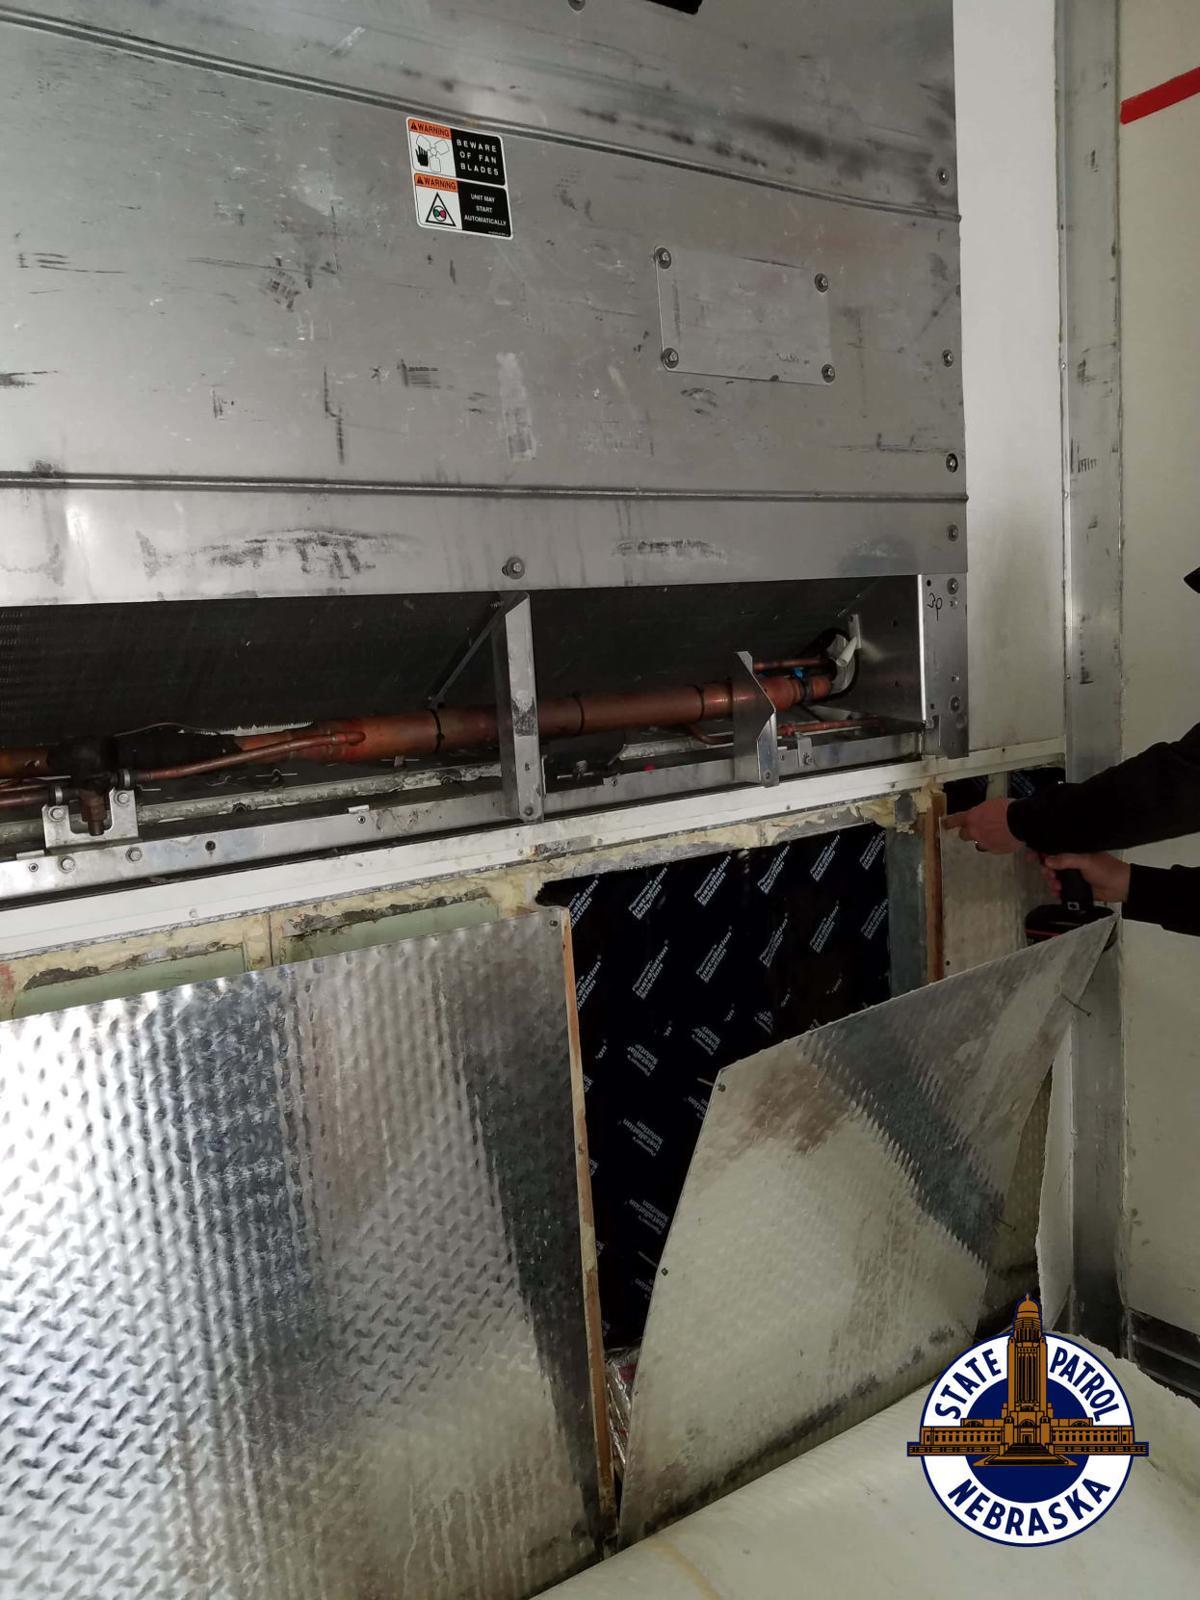 Compartment where drugs were found